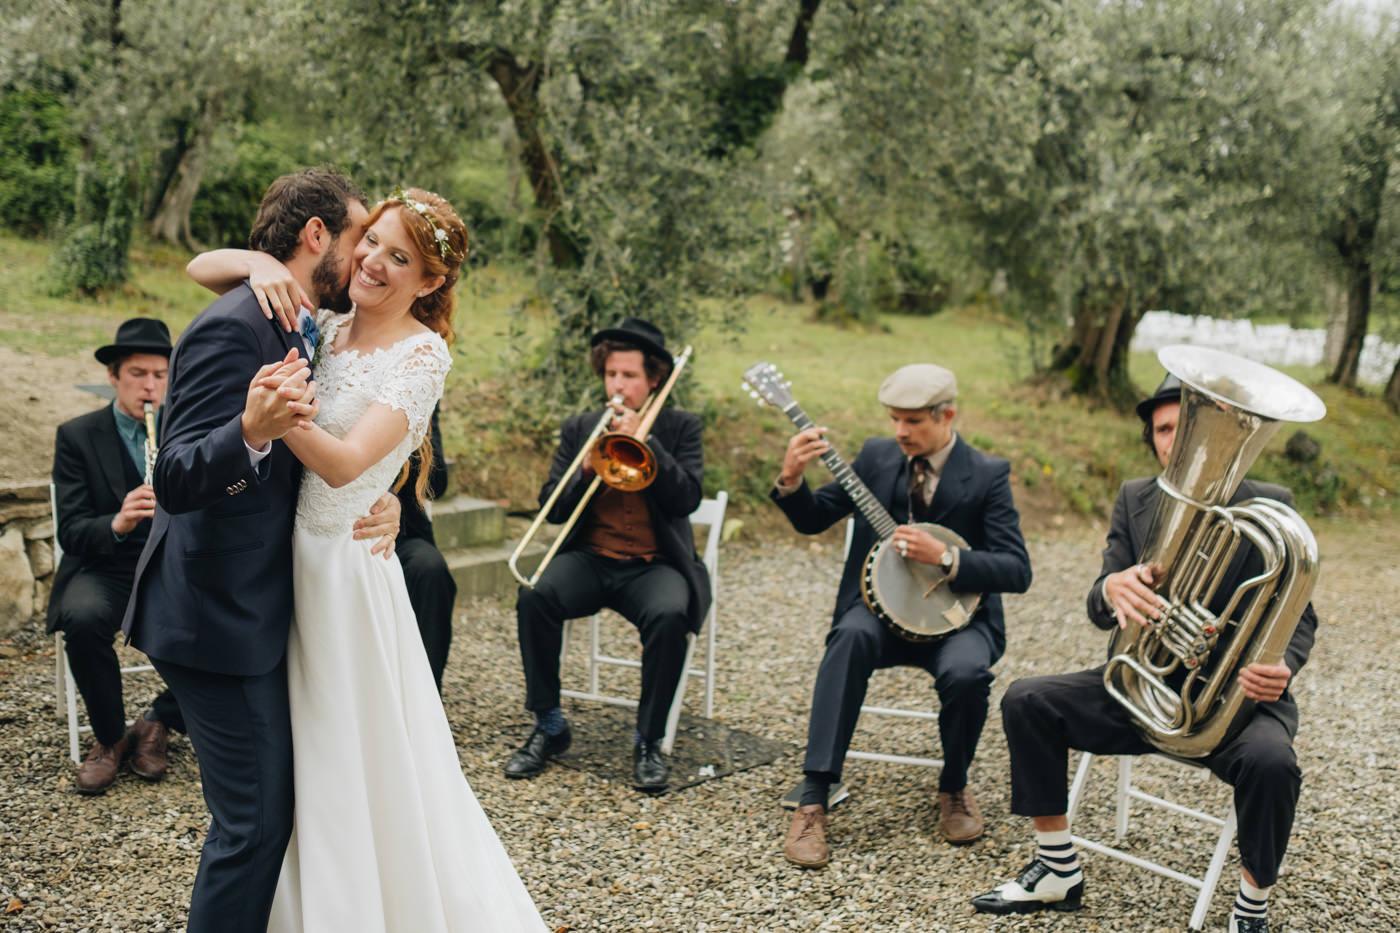 matrimoni_all_italiana_fotografo_matrimonio_toscana-54.jpg